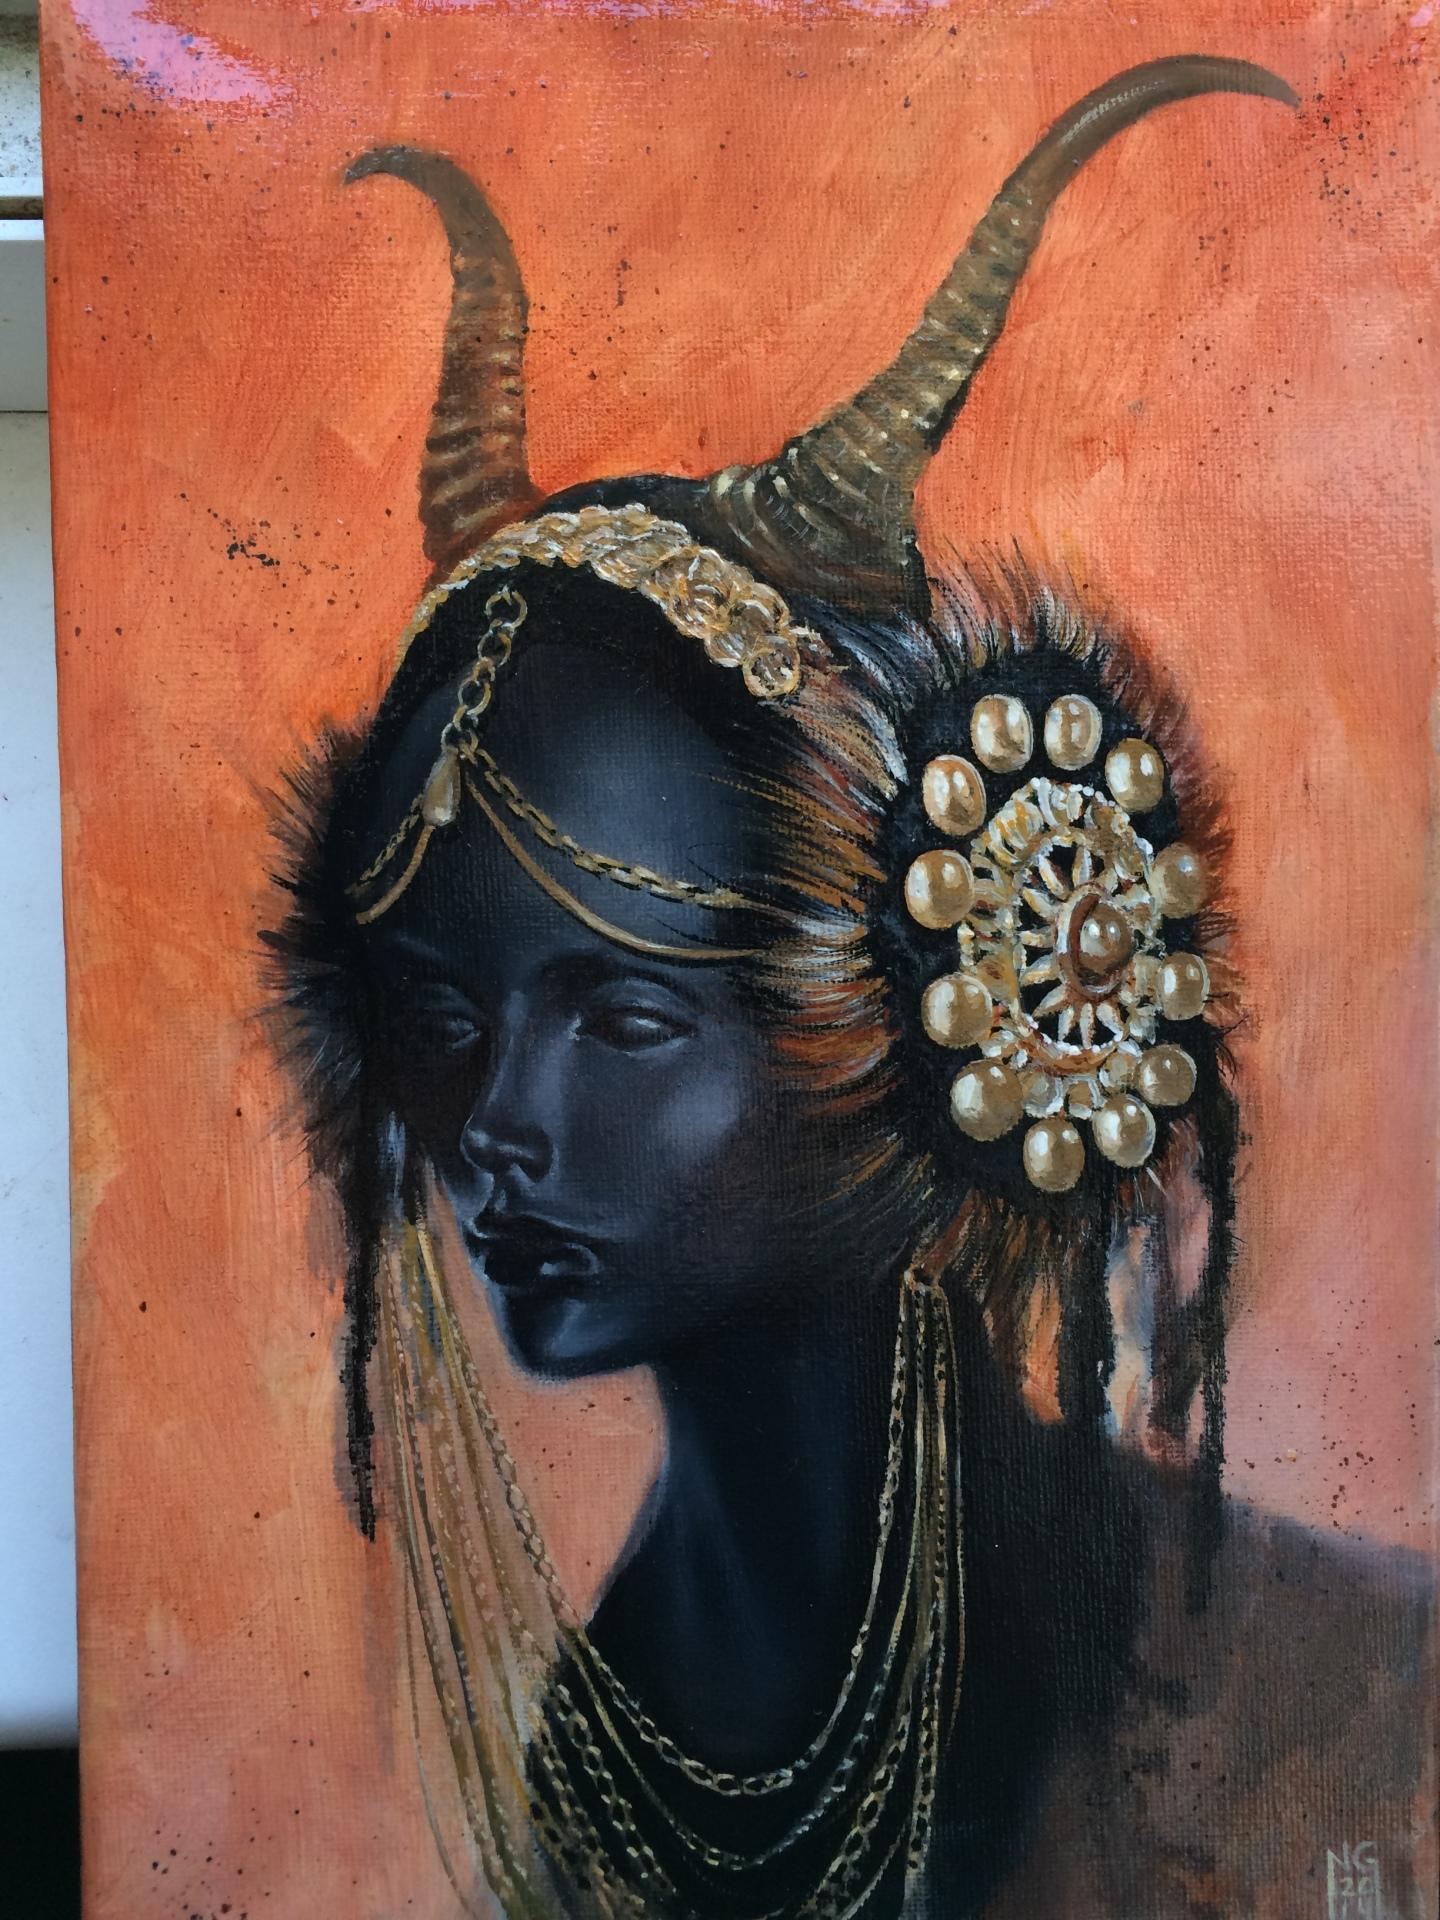 Warrior Queen born from ash